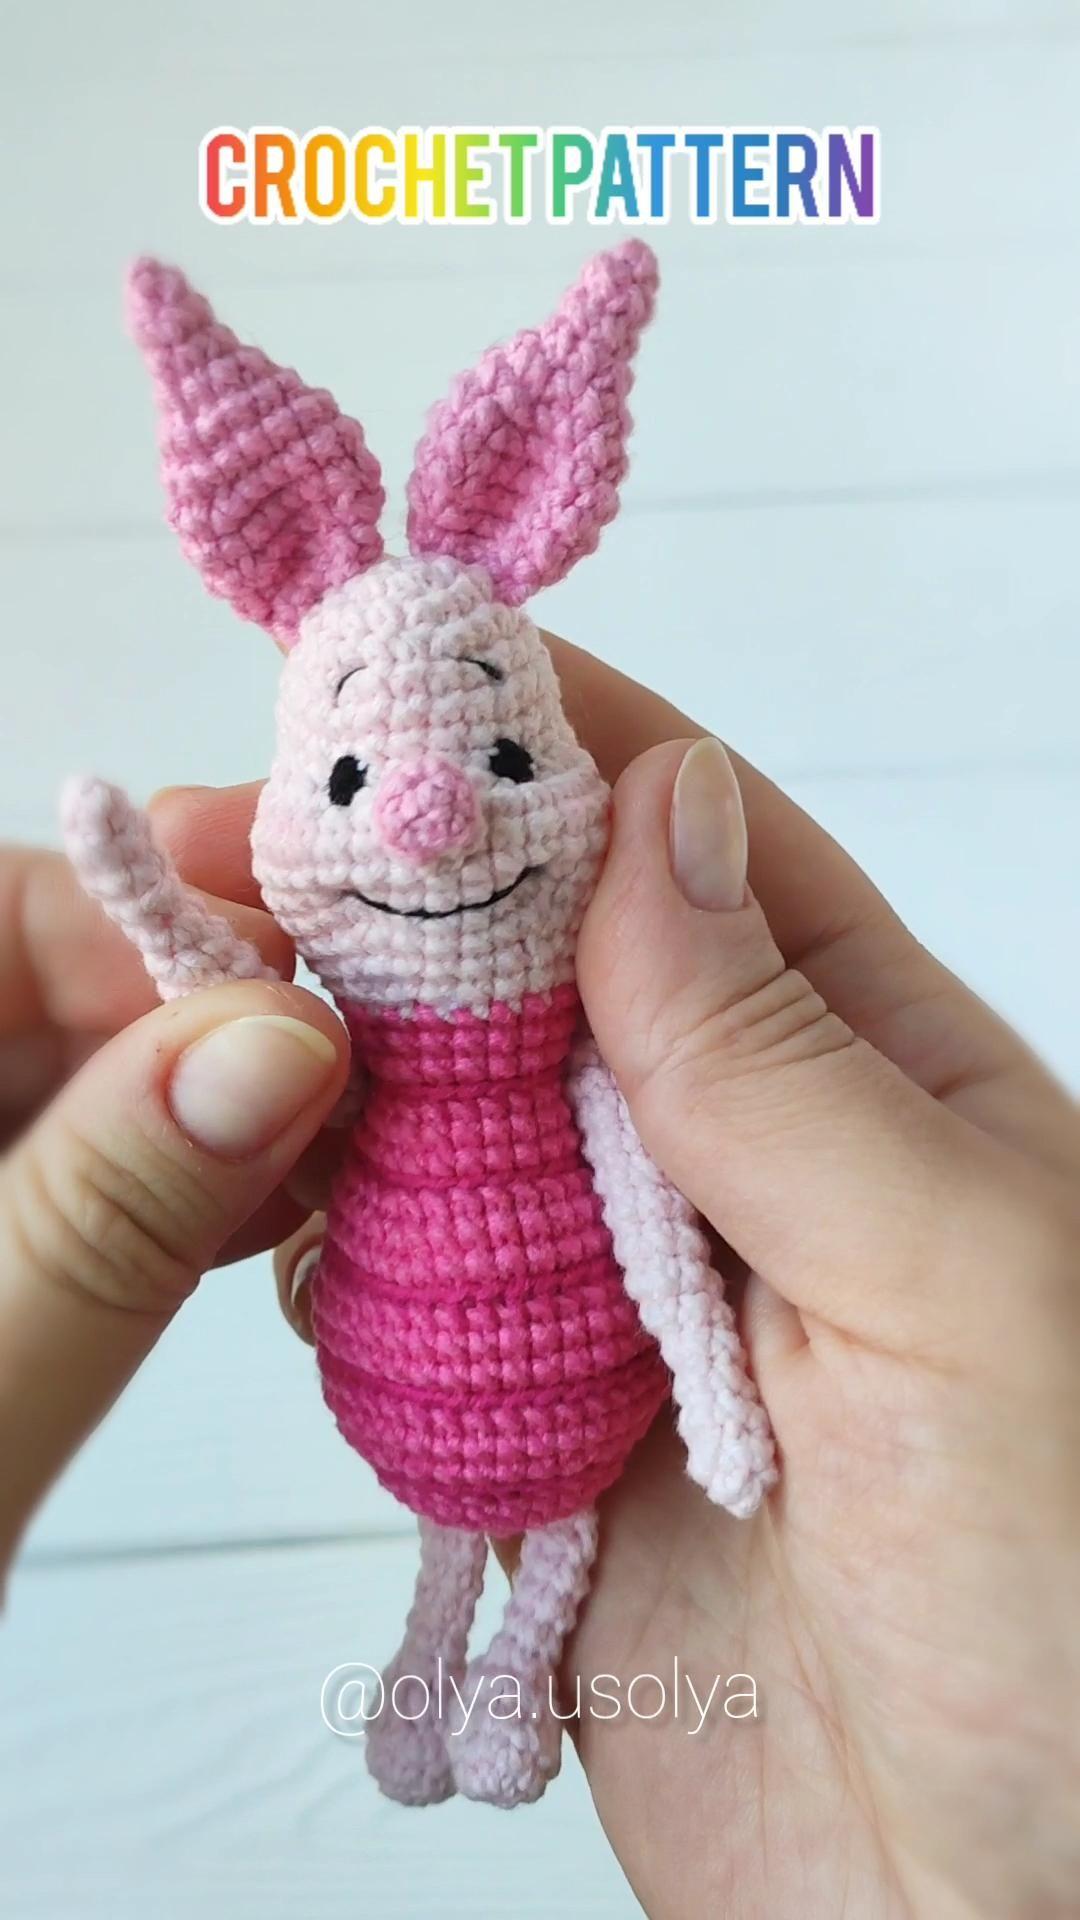 Piglet Crochet pattern,PDF ENGLISH, amigurumi design,  baby gift toy, stuffed toy tutorial, diy